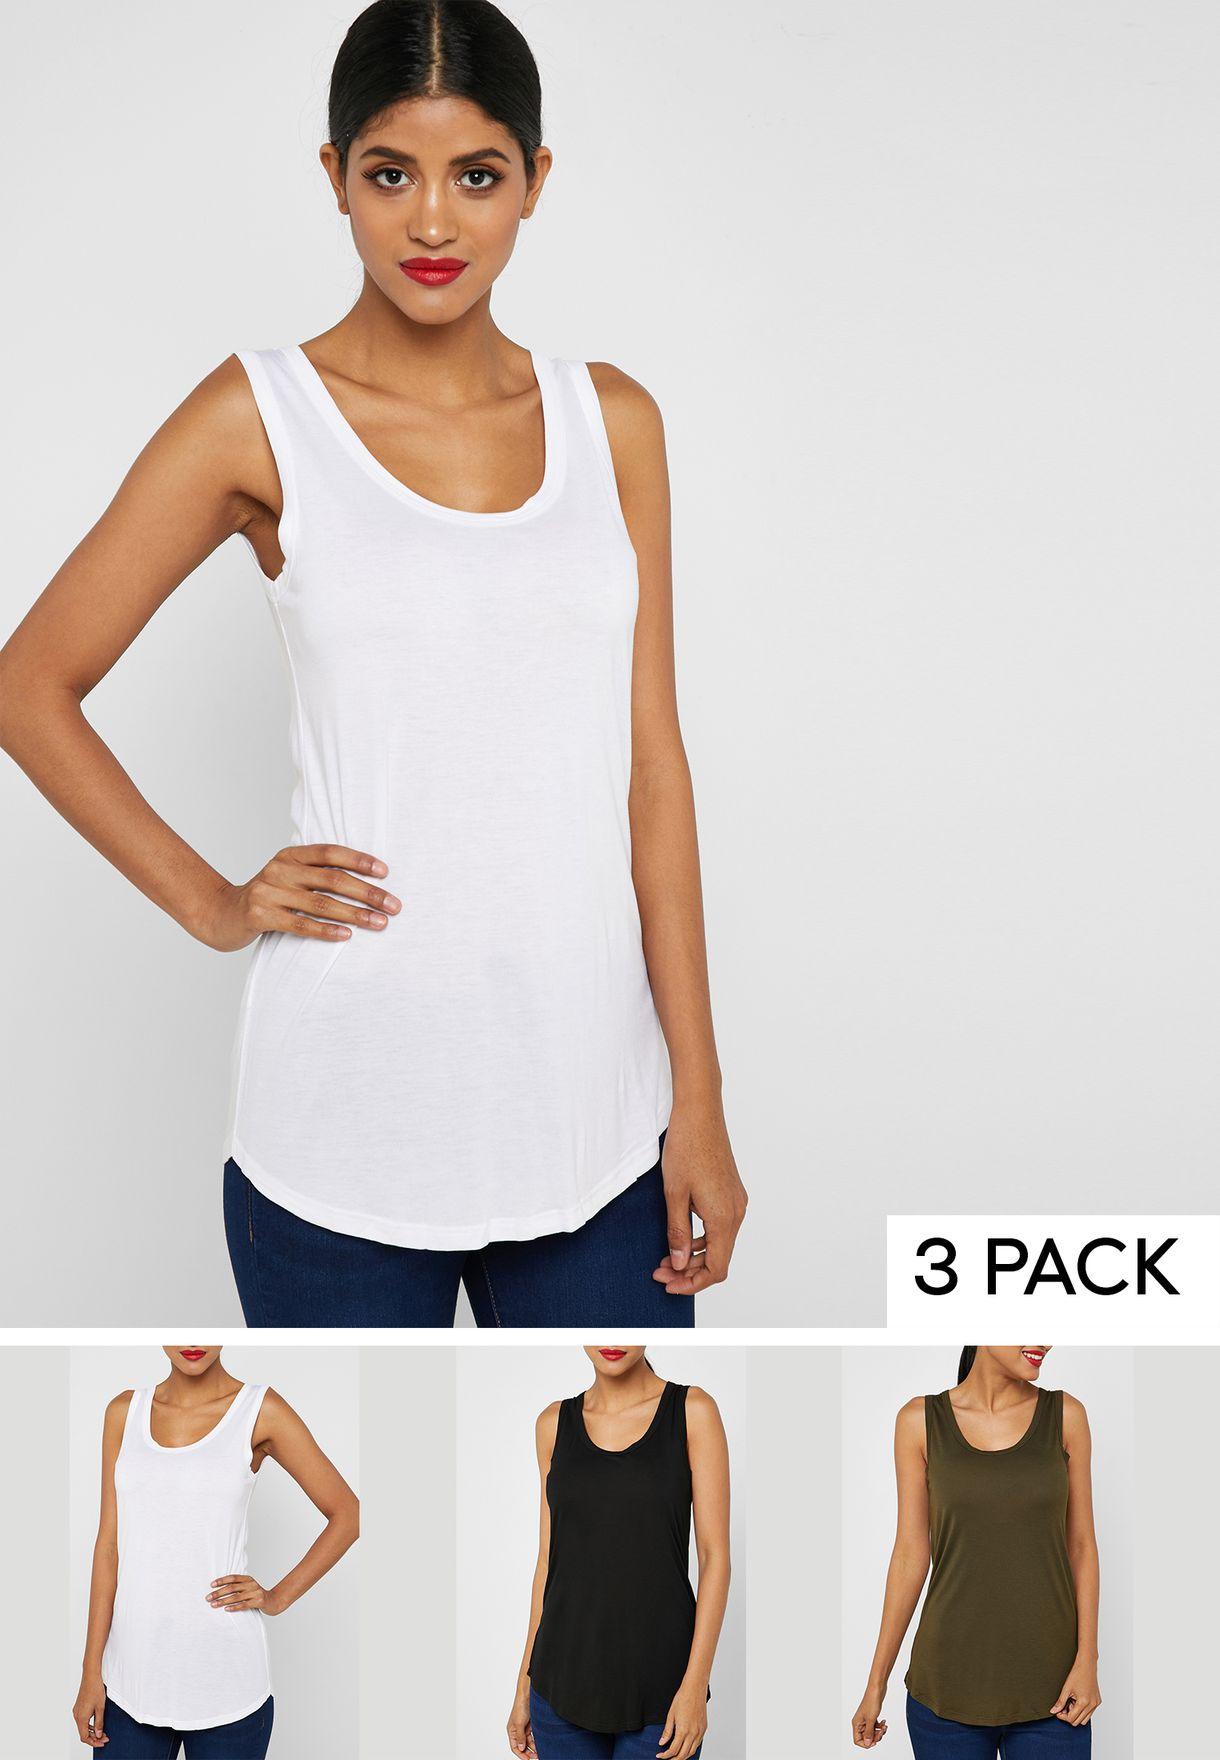 3 Pack Longline Vest